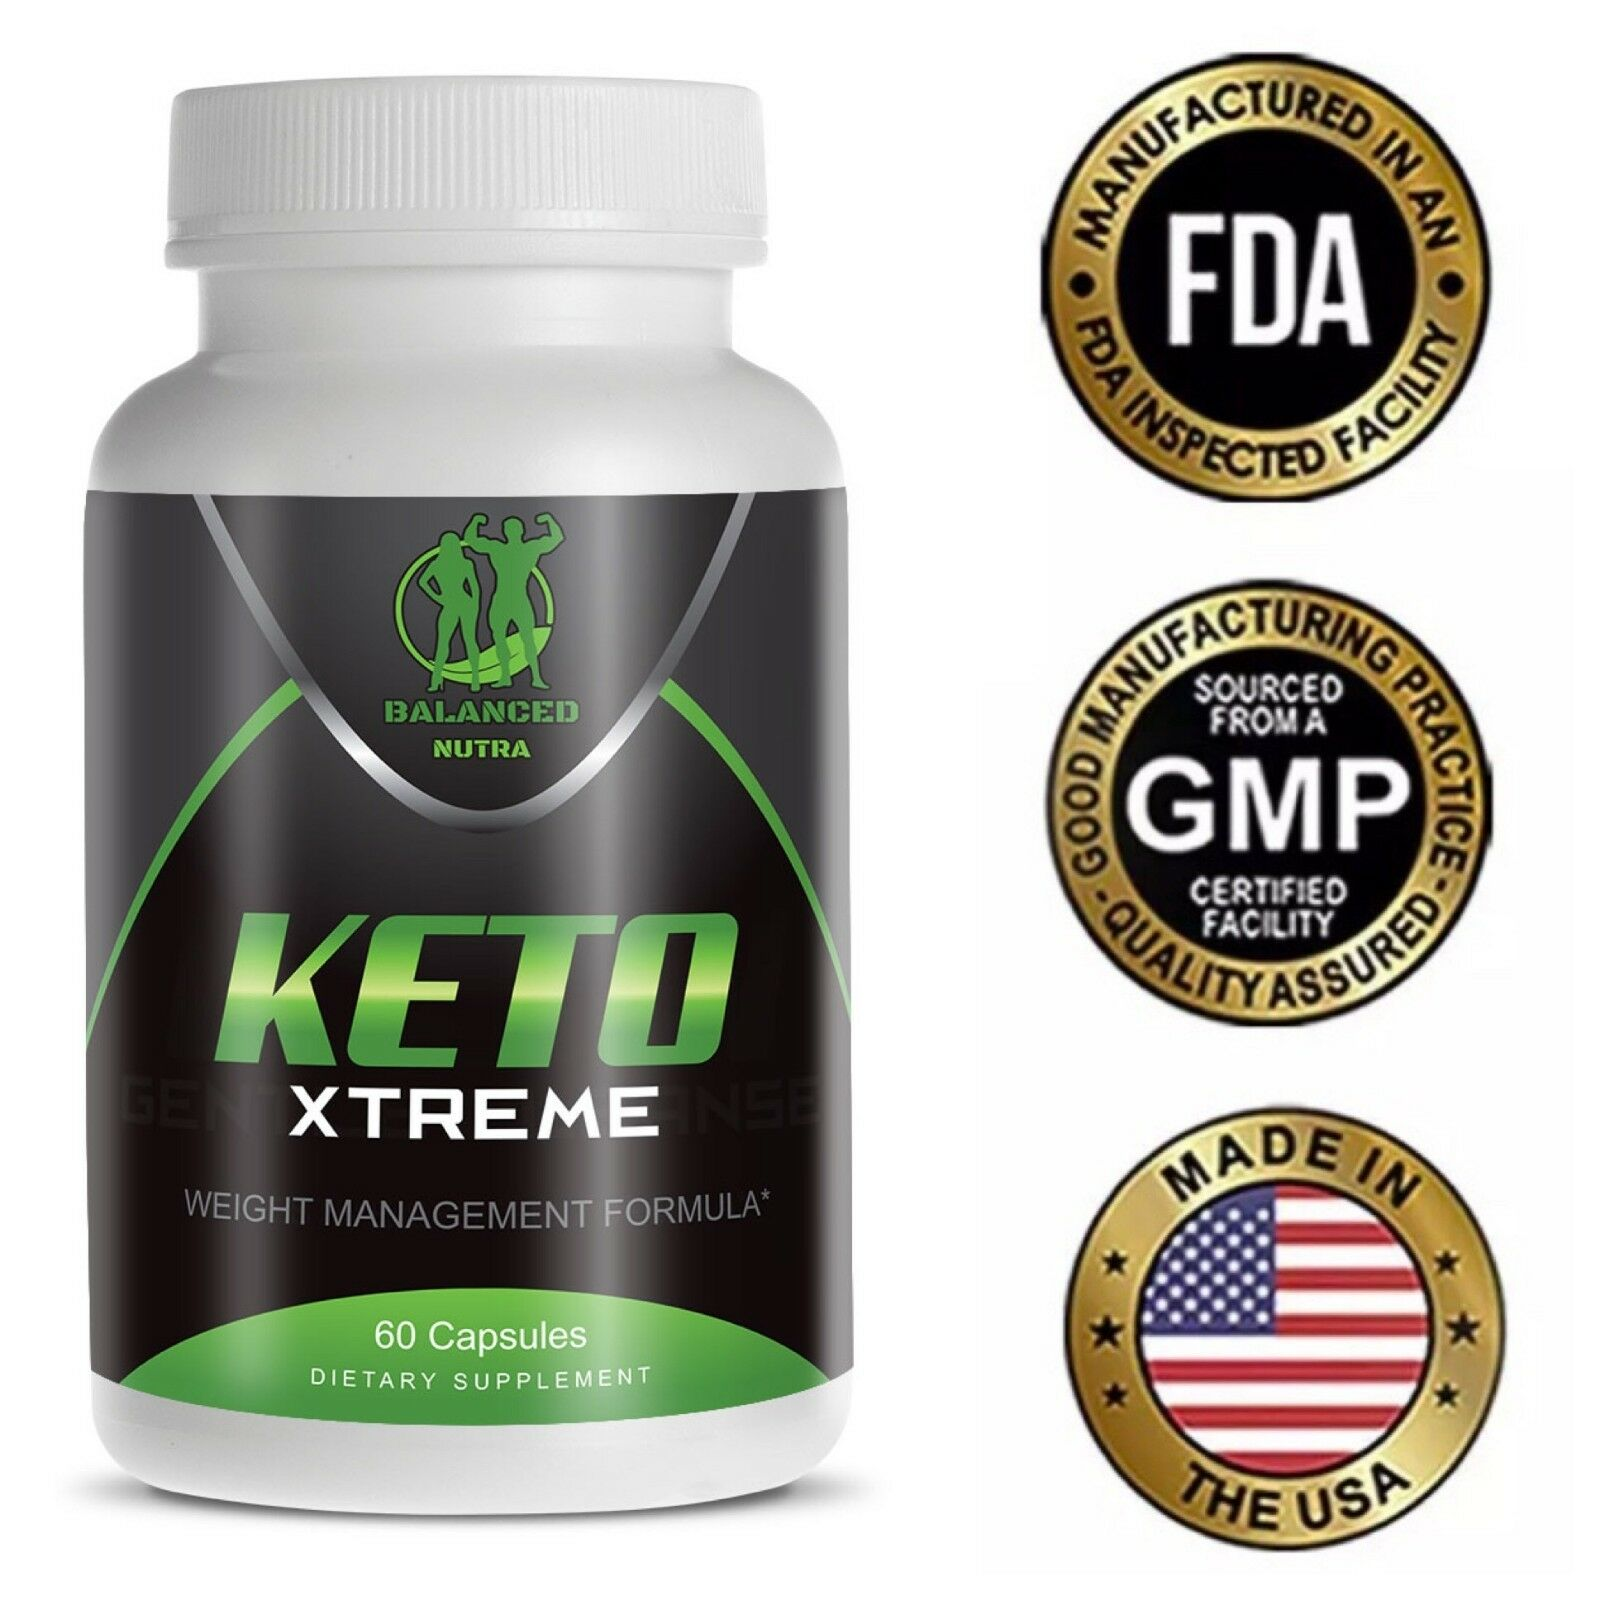 Keto Diet Pills Keto xtreme Best Weight Loss Diet Pill Carb Blocker 30 Day Pack